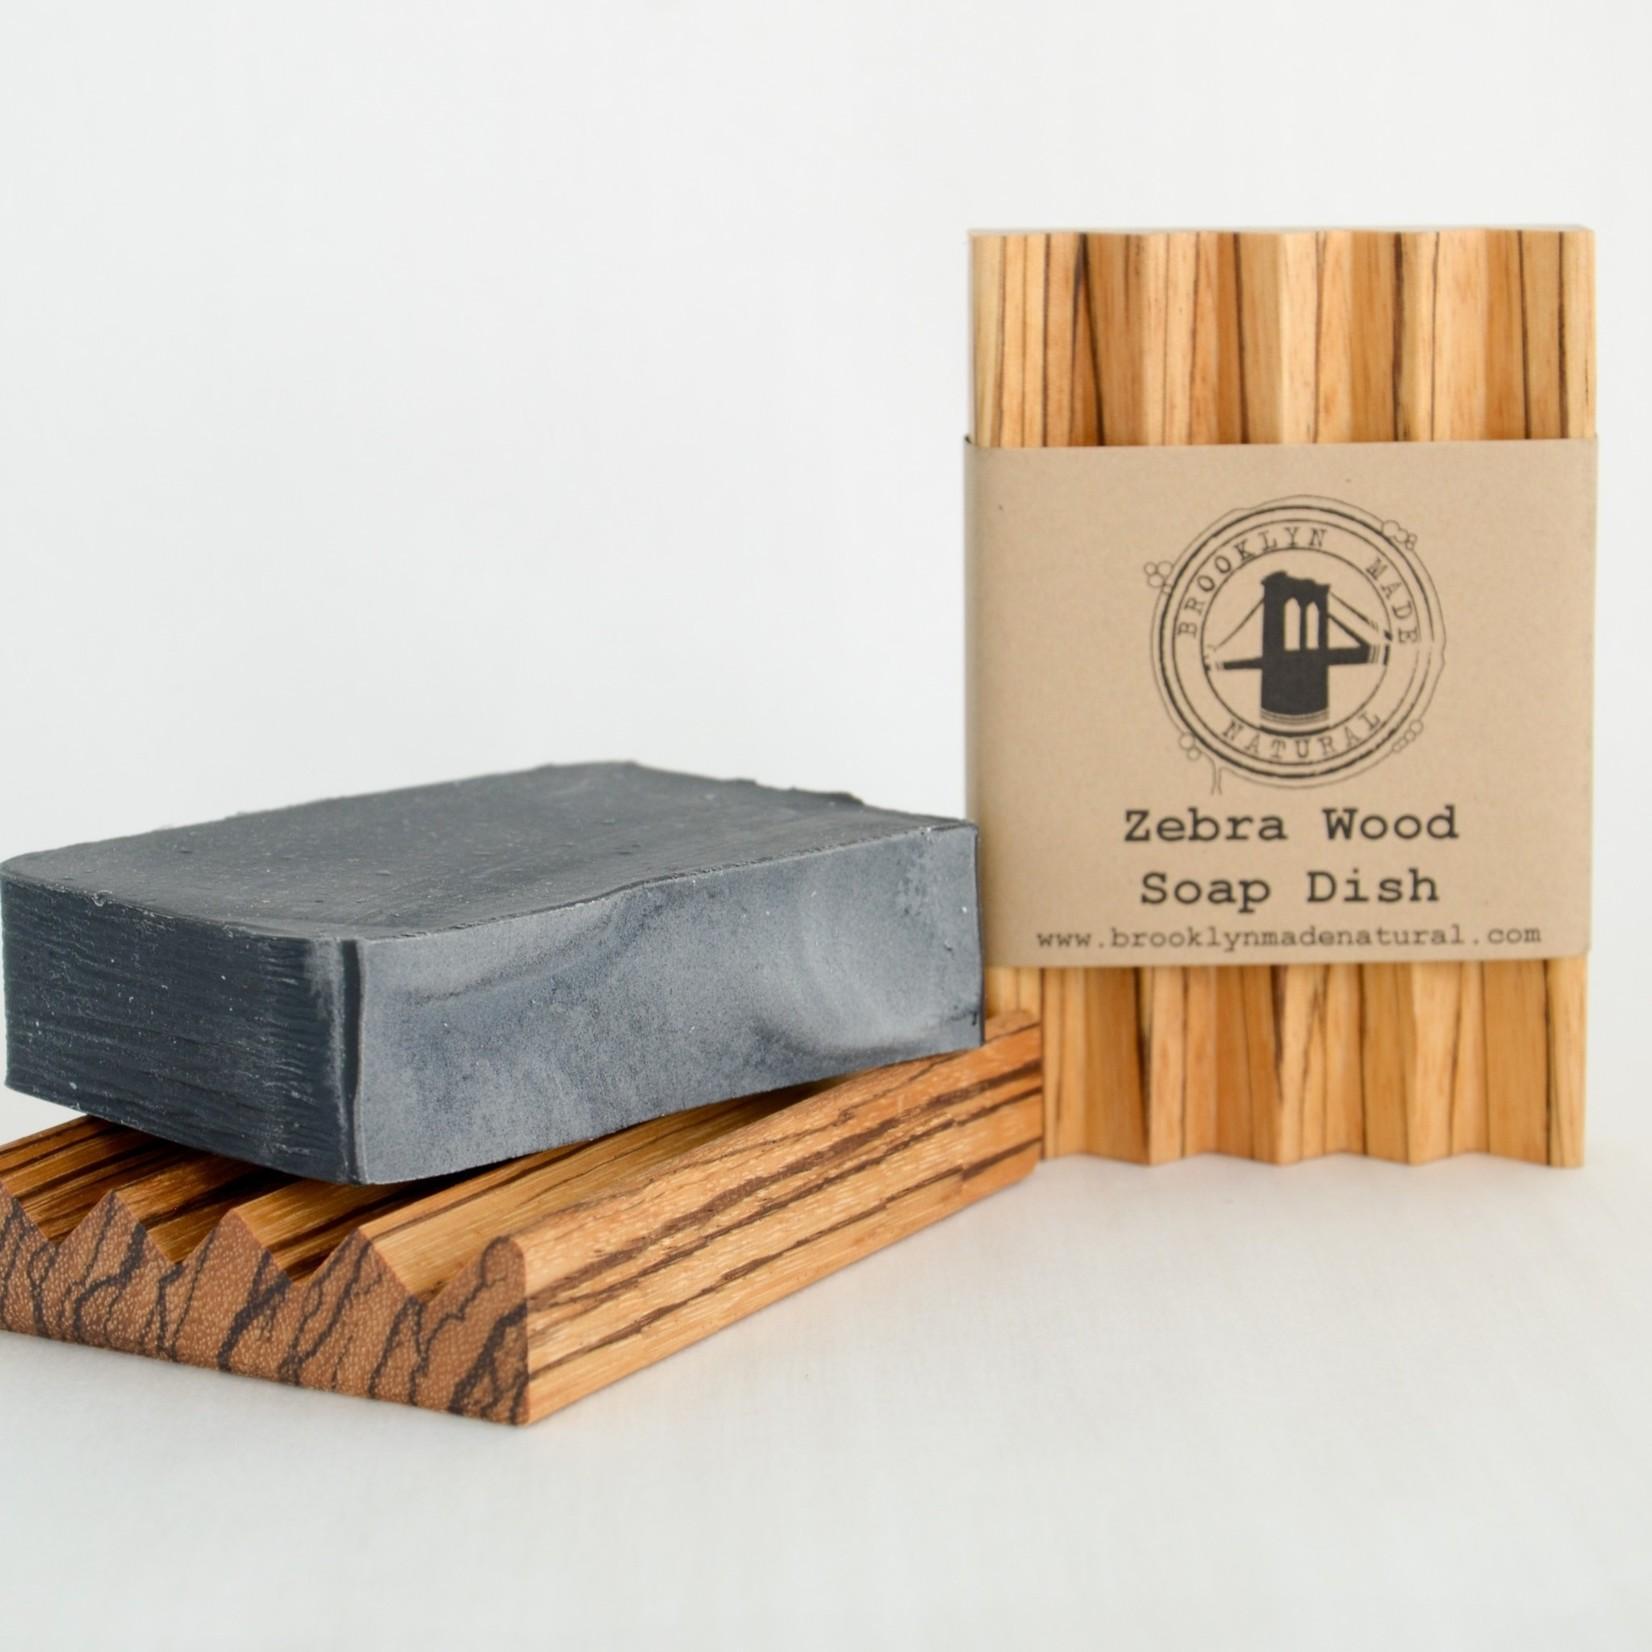 Brooklyn Made Natural Brooklyn Made Natural Zebrawood Soap Dish